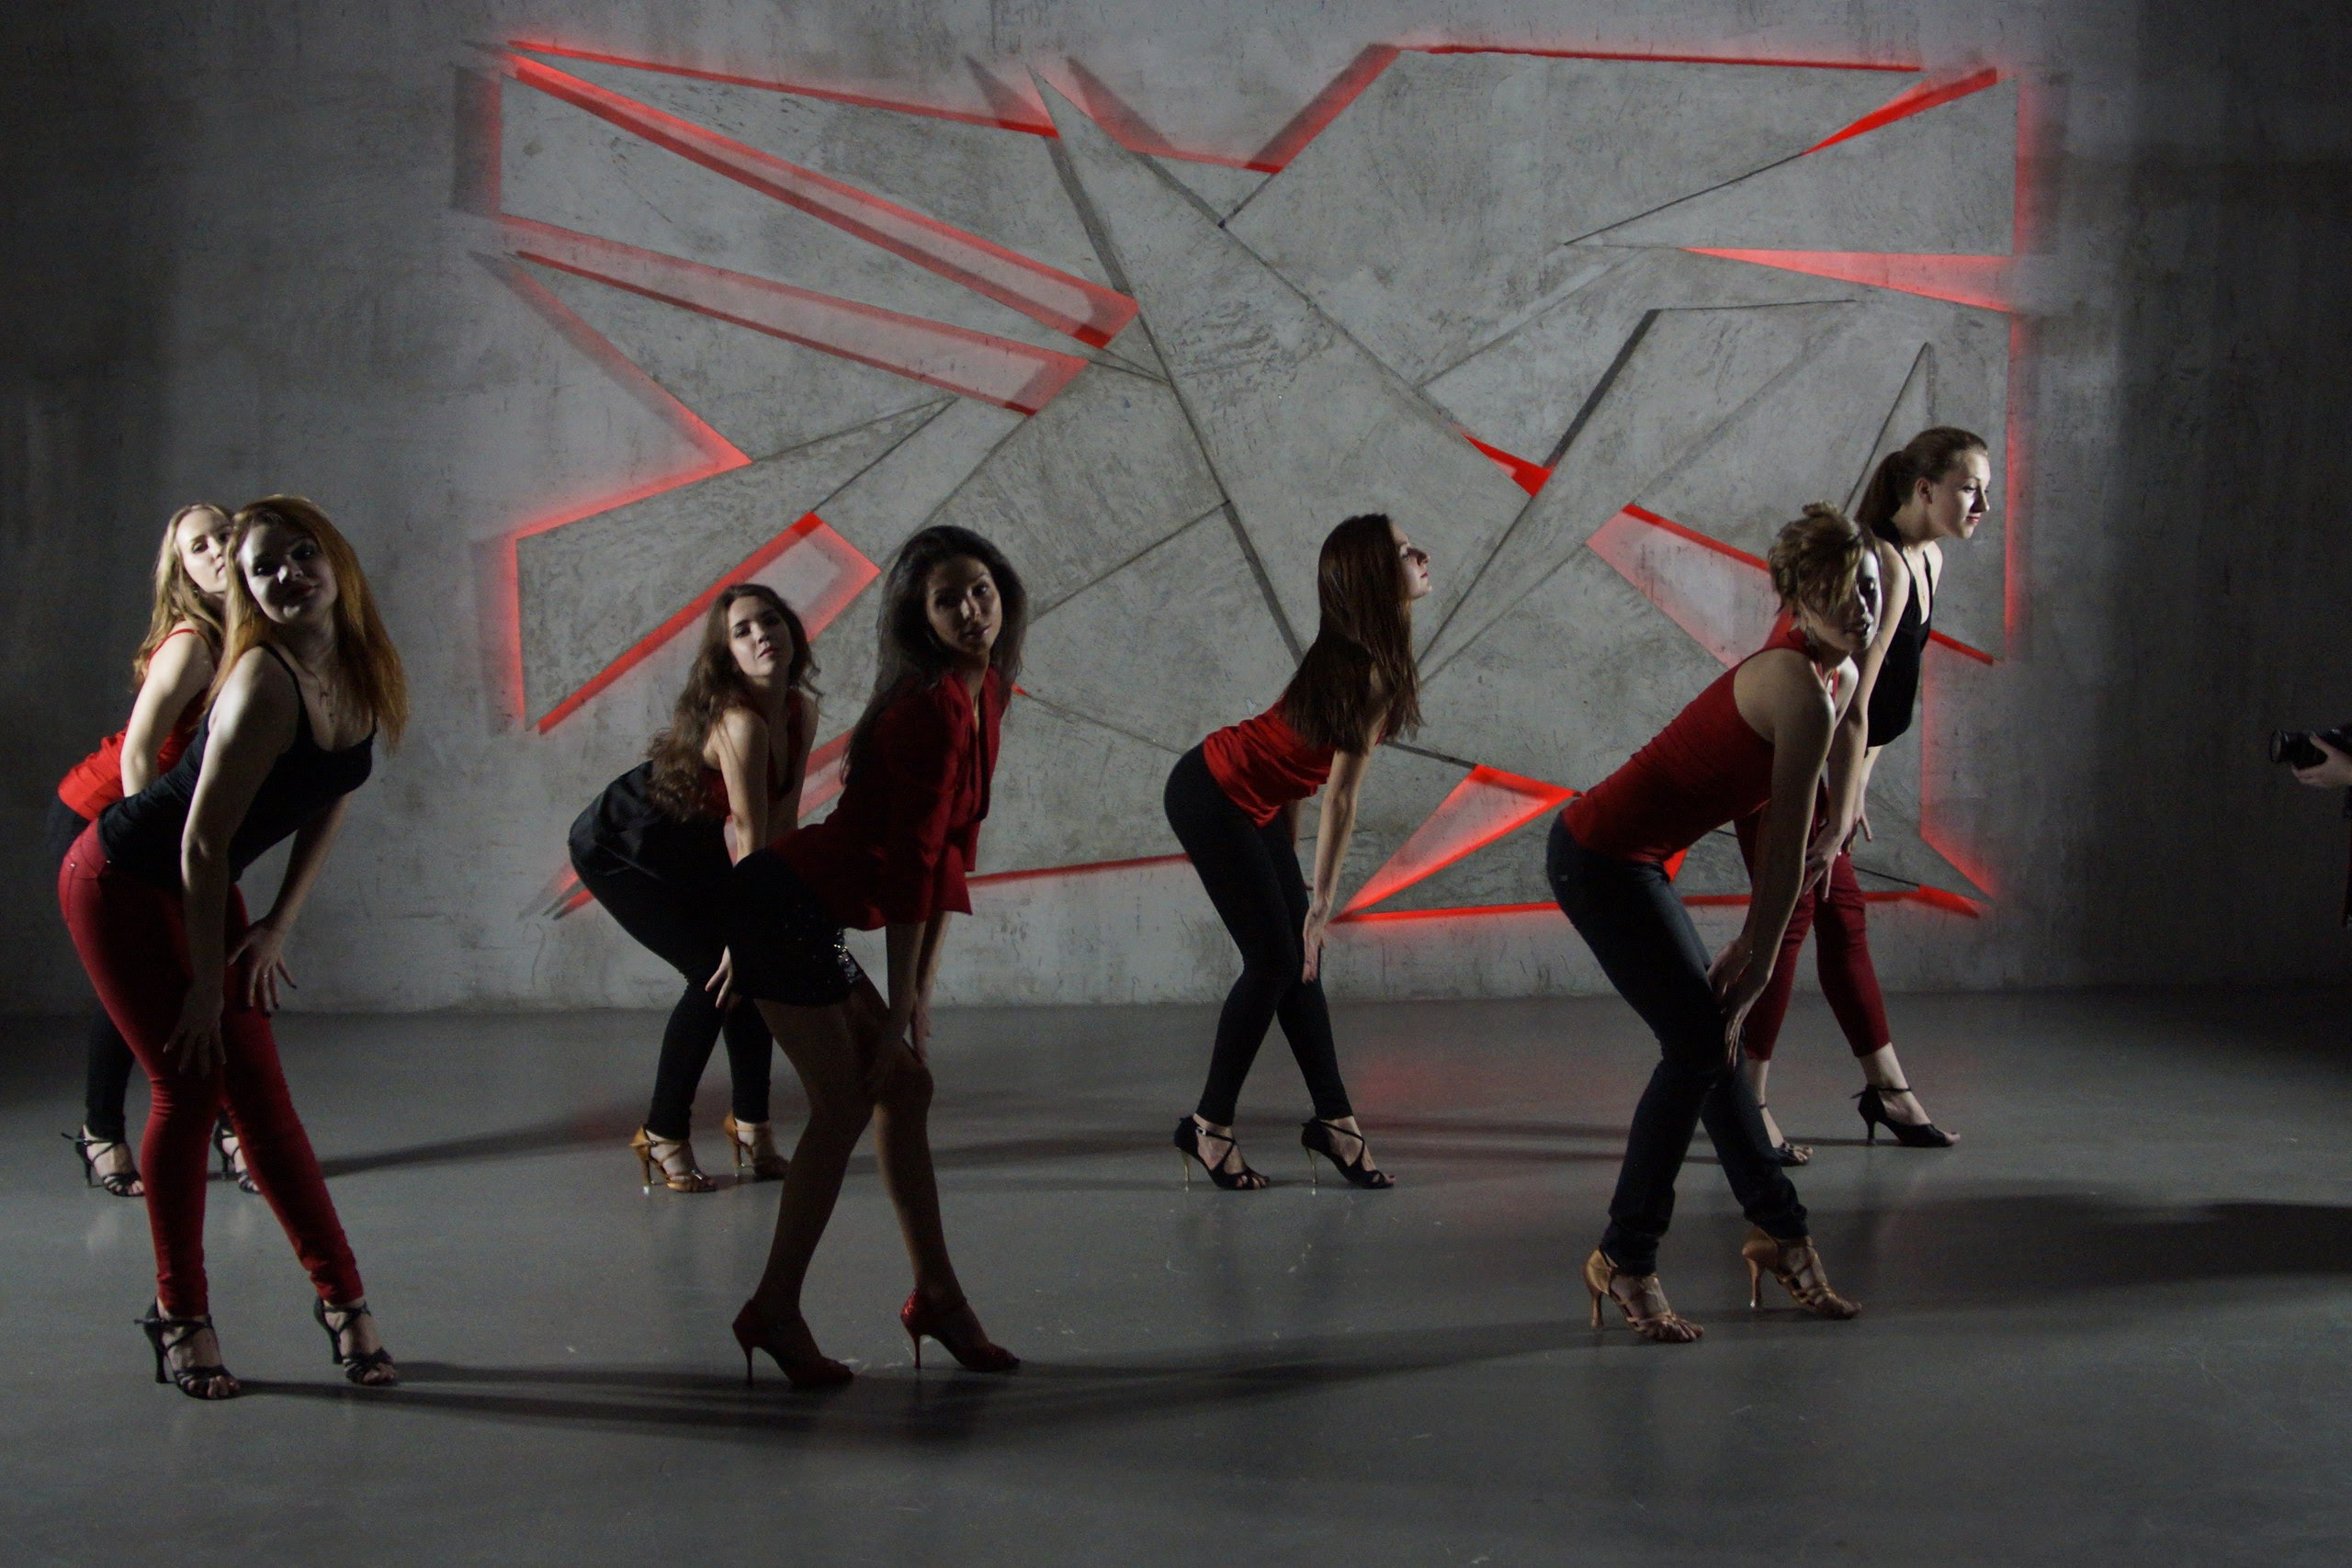 ladys dance